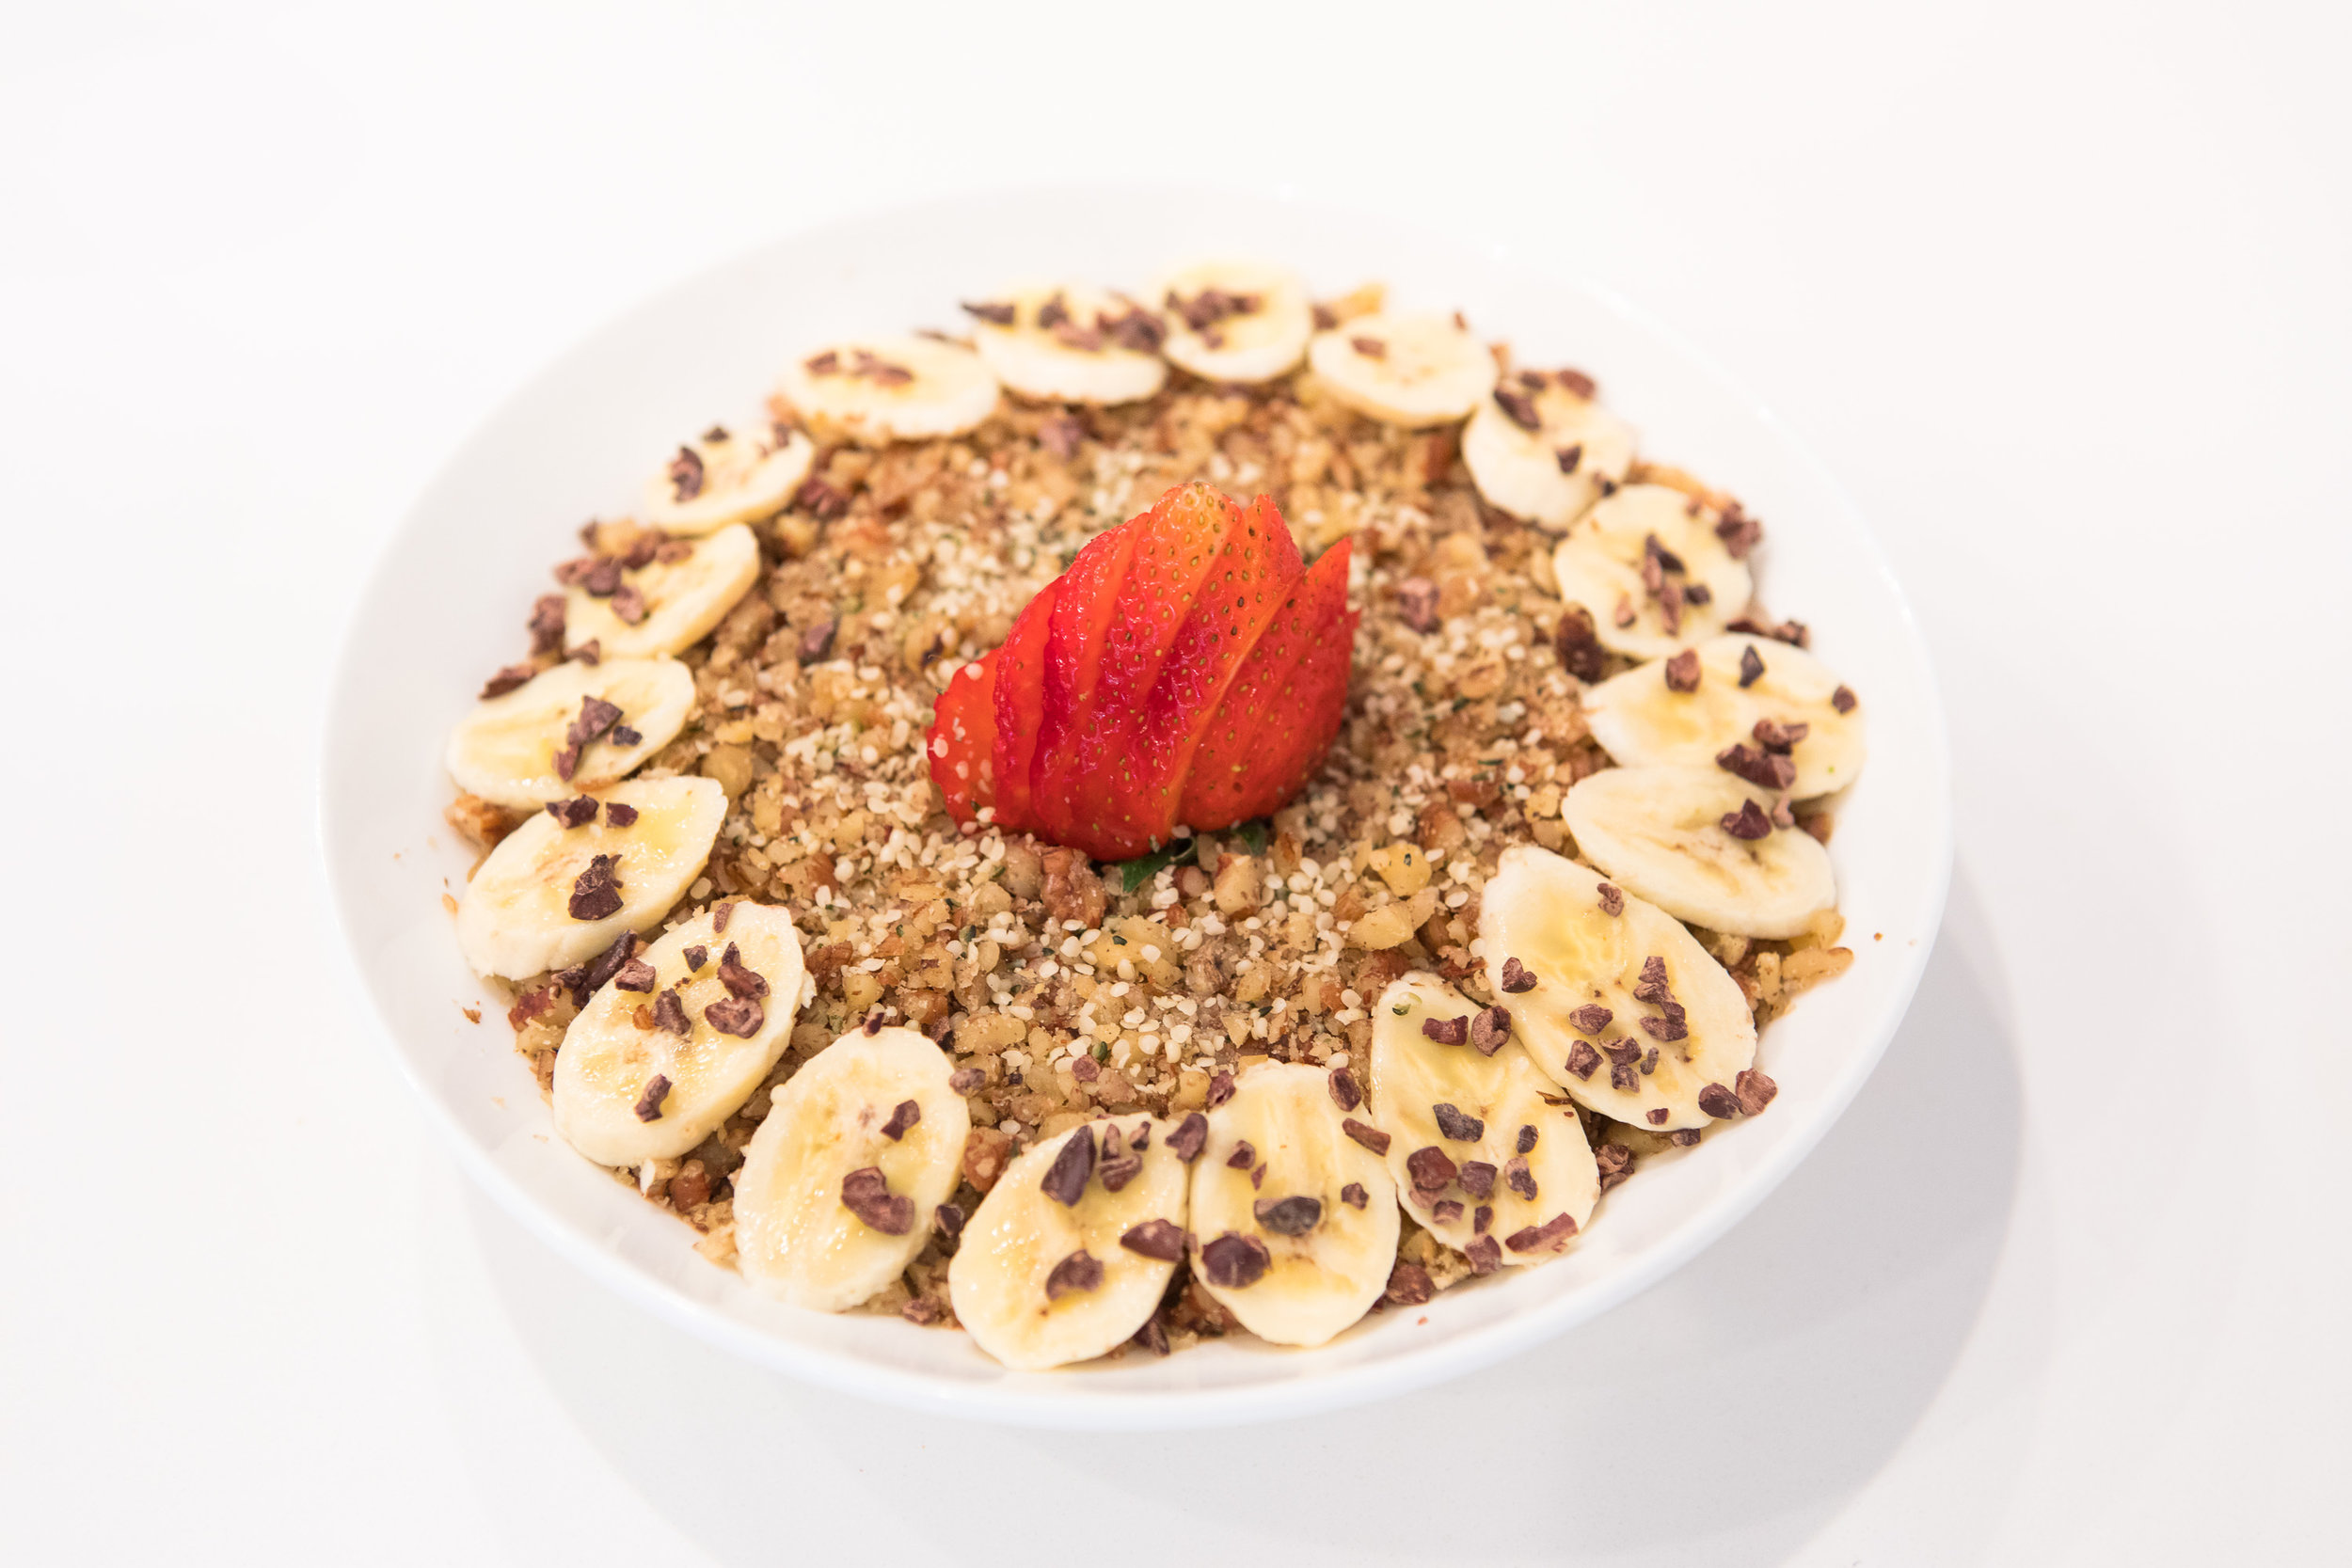 maka-vegan-gluten-free-cafe-breakfast-bowl-15.jpg